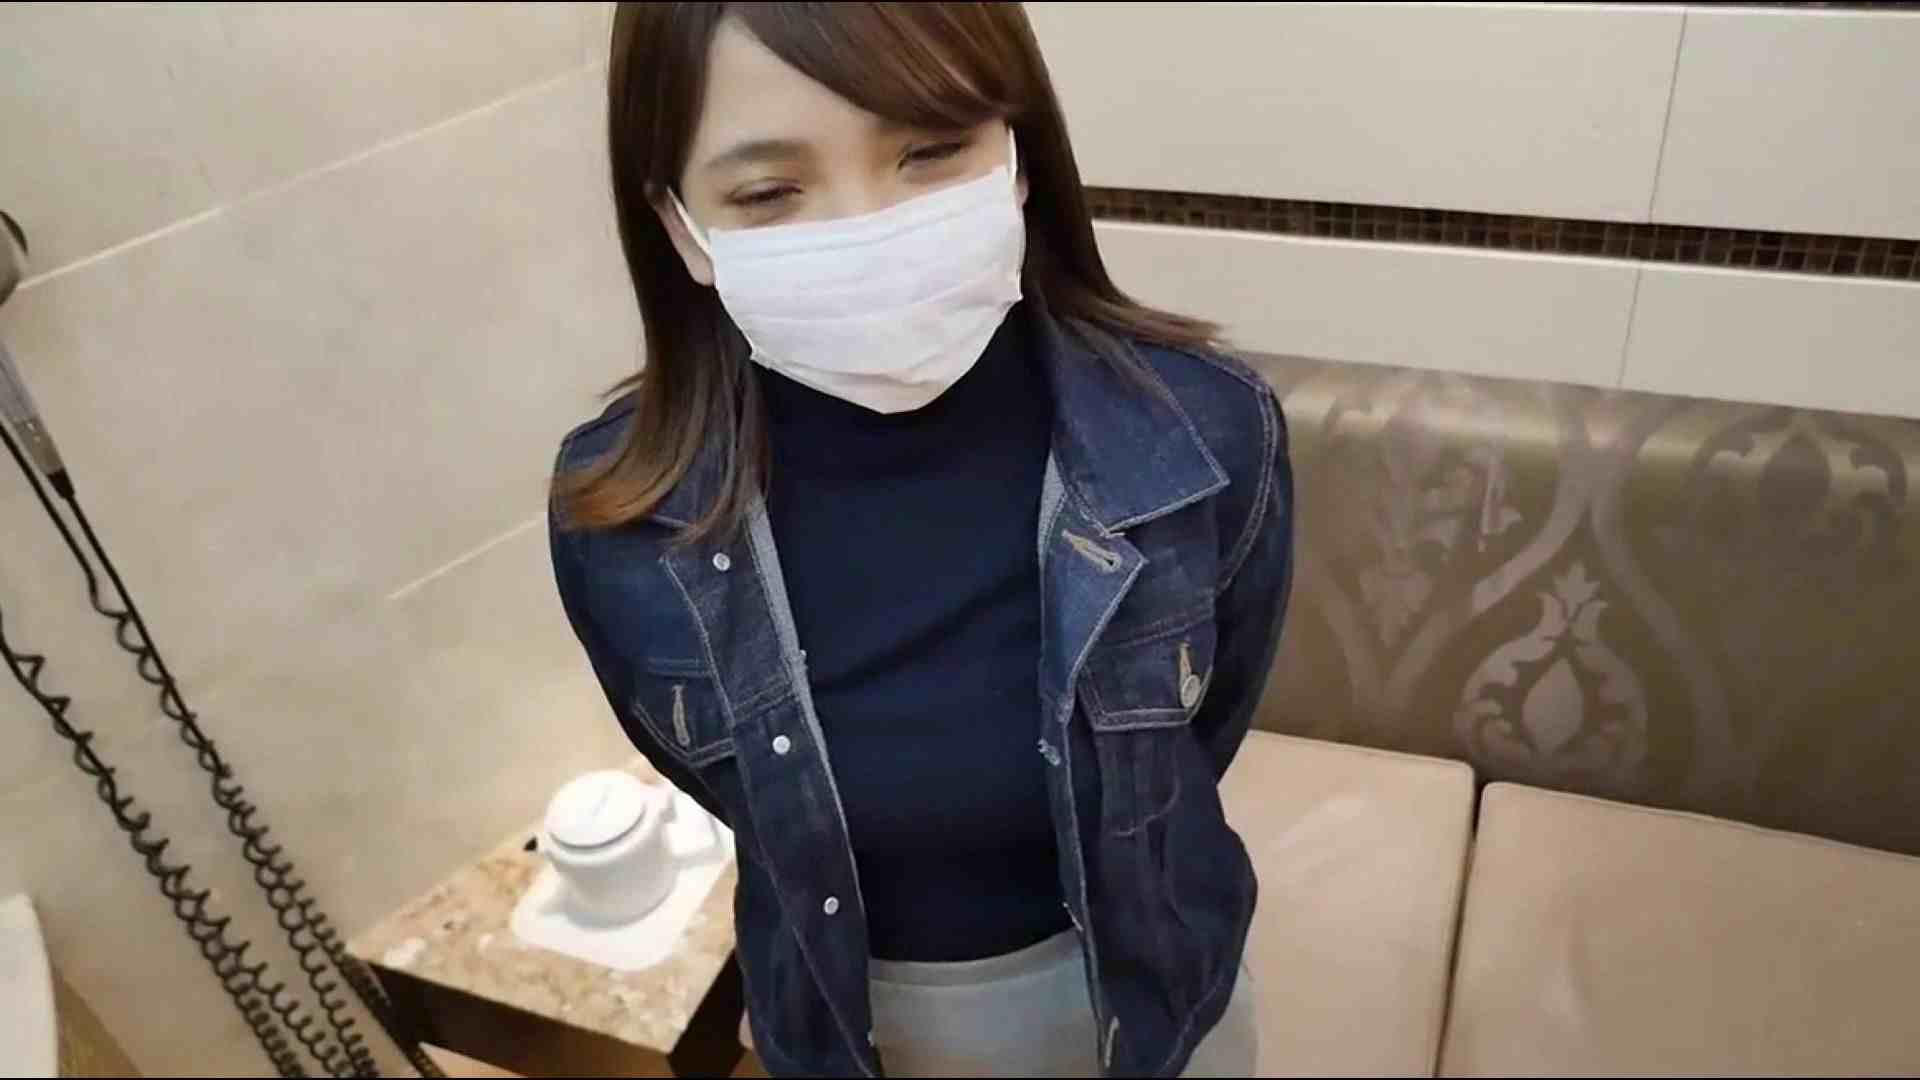 S級厳選美女ビッチガールVol.41 前編 OL女体  105連発 2